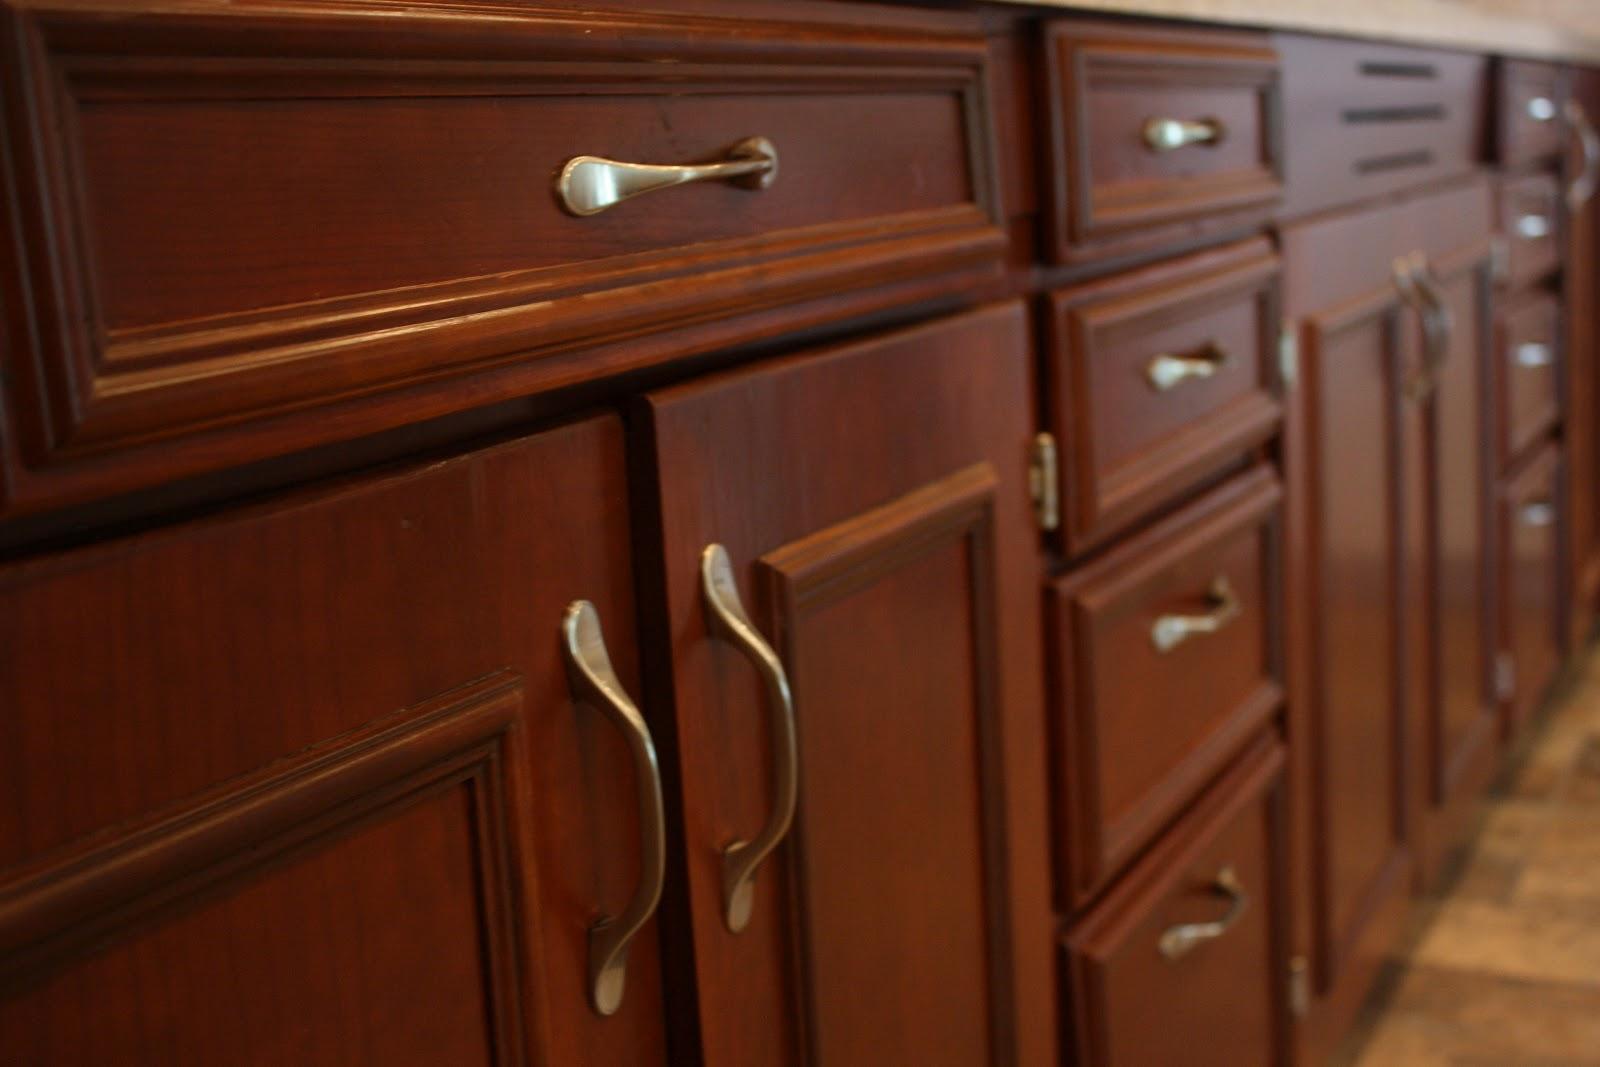 1920s kitchen cabinets